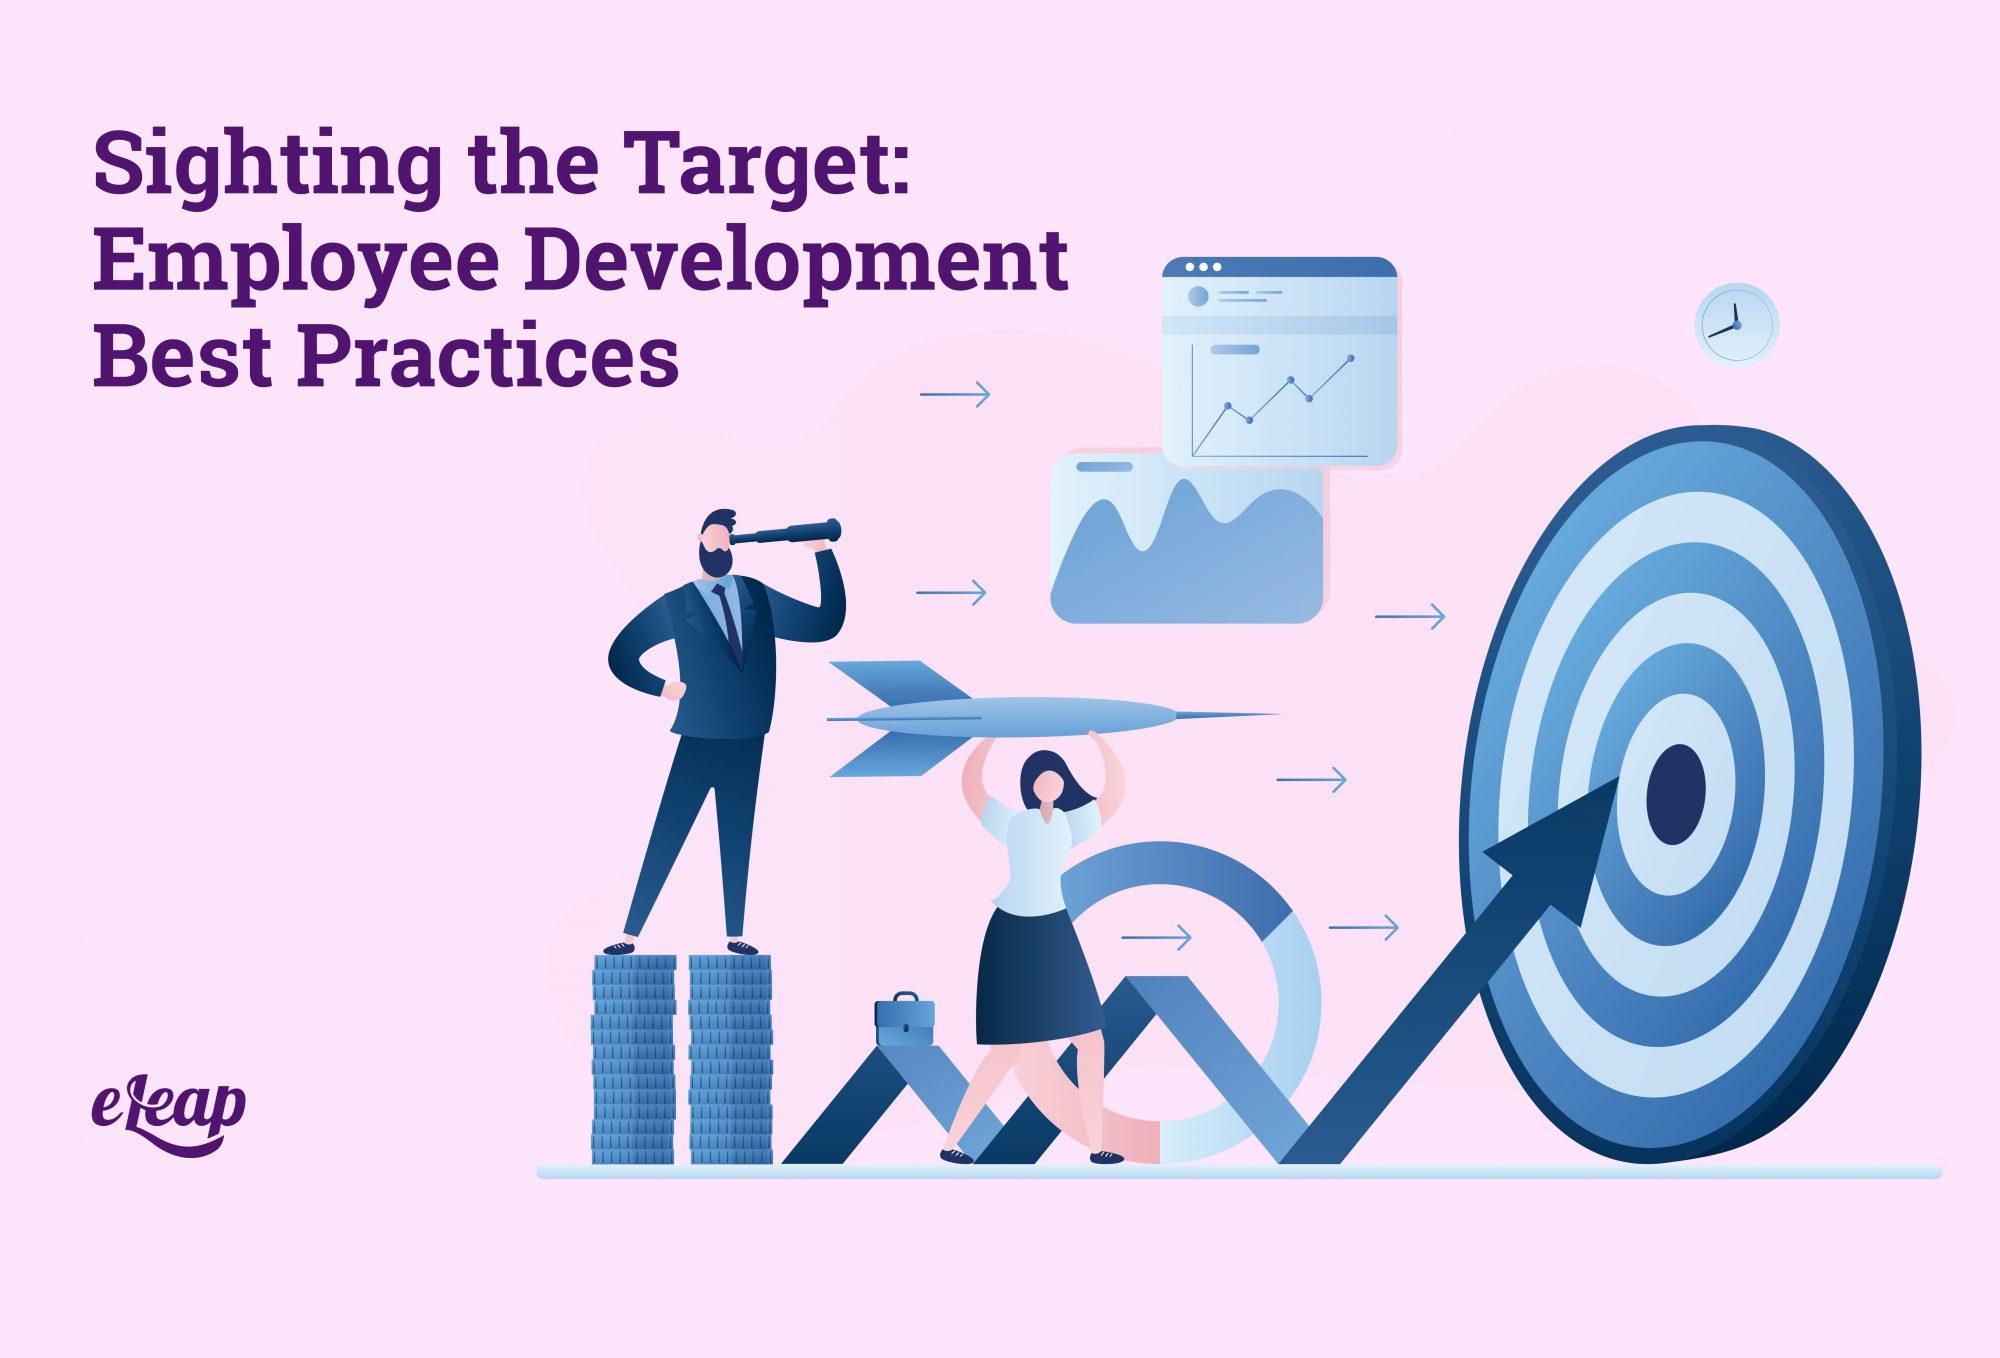 Sighting the Target: Employee Development Best Practices